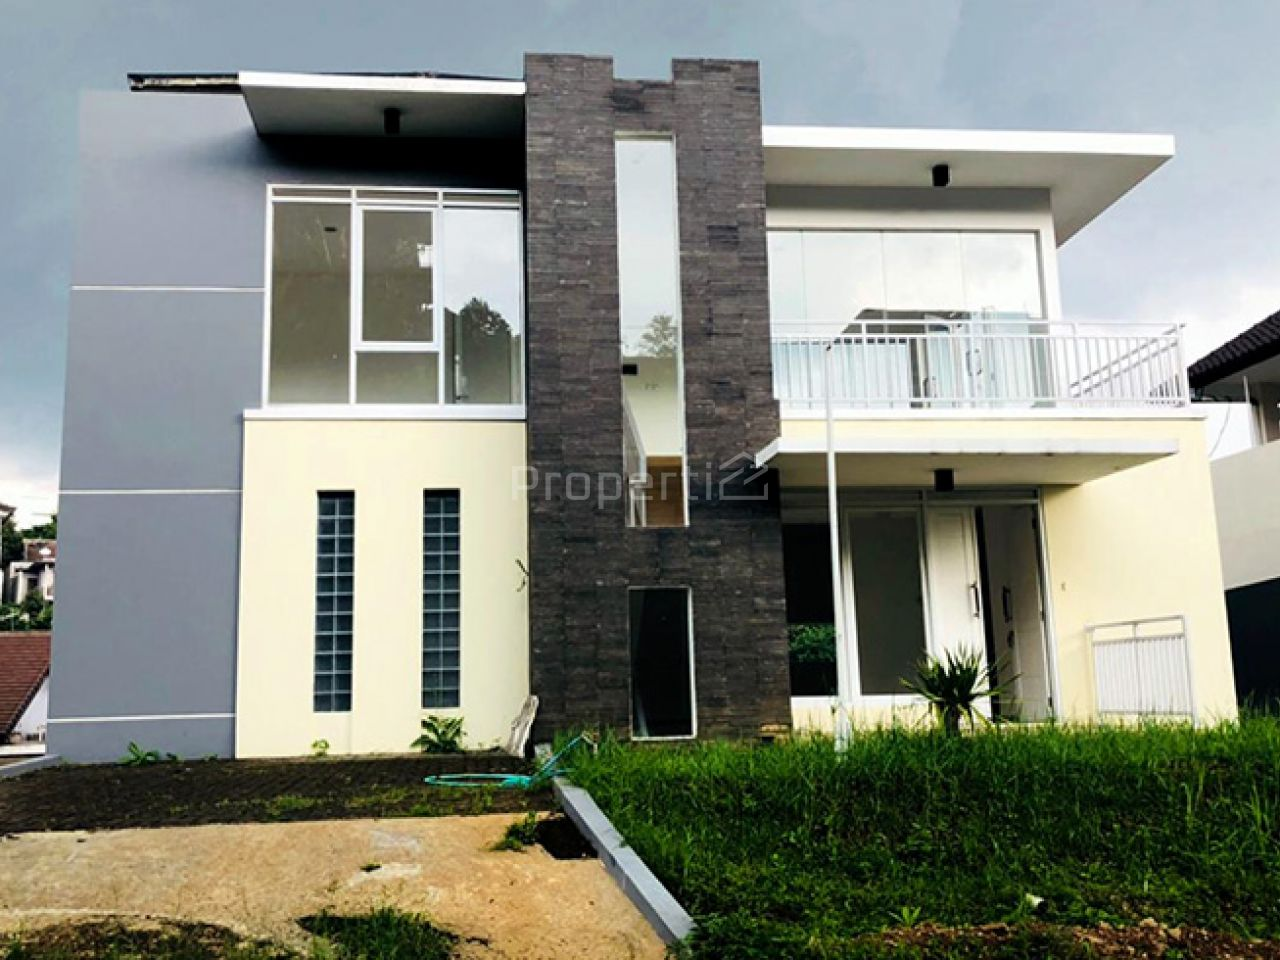 Rumah Baru di Resor Dago Pakar, Jawa Barat